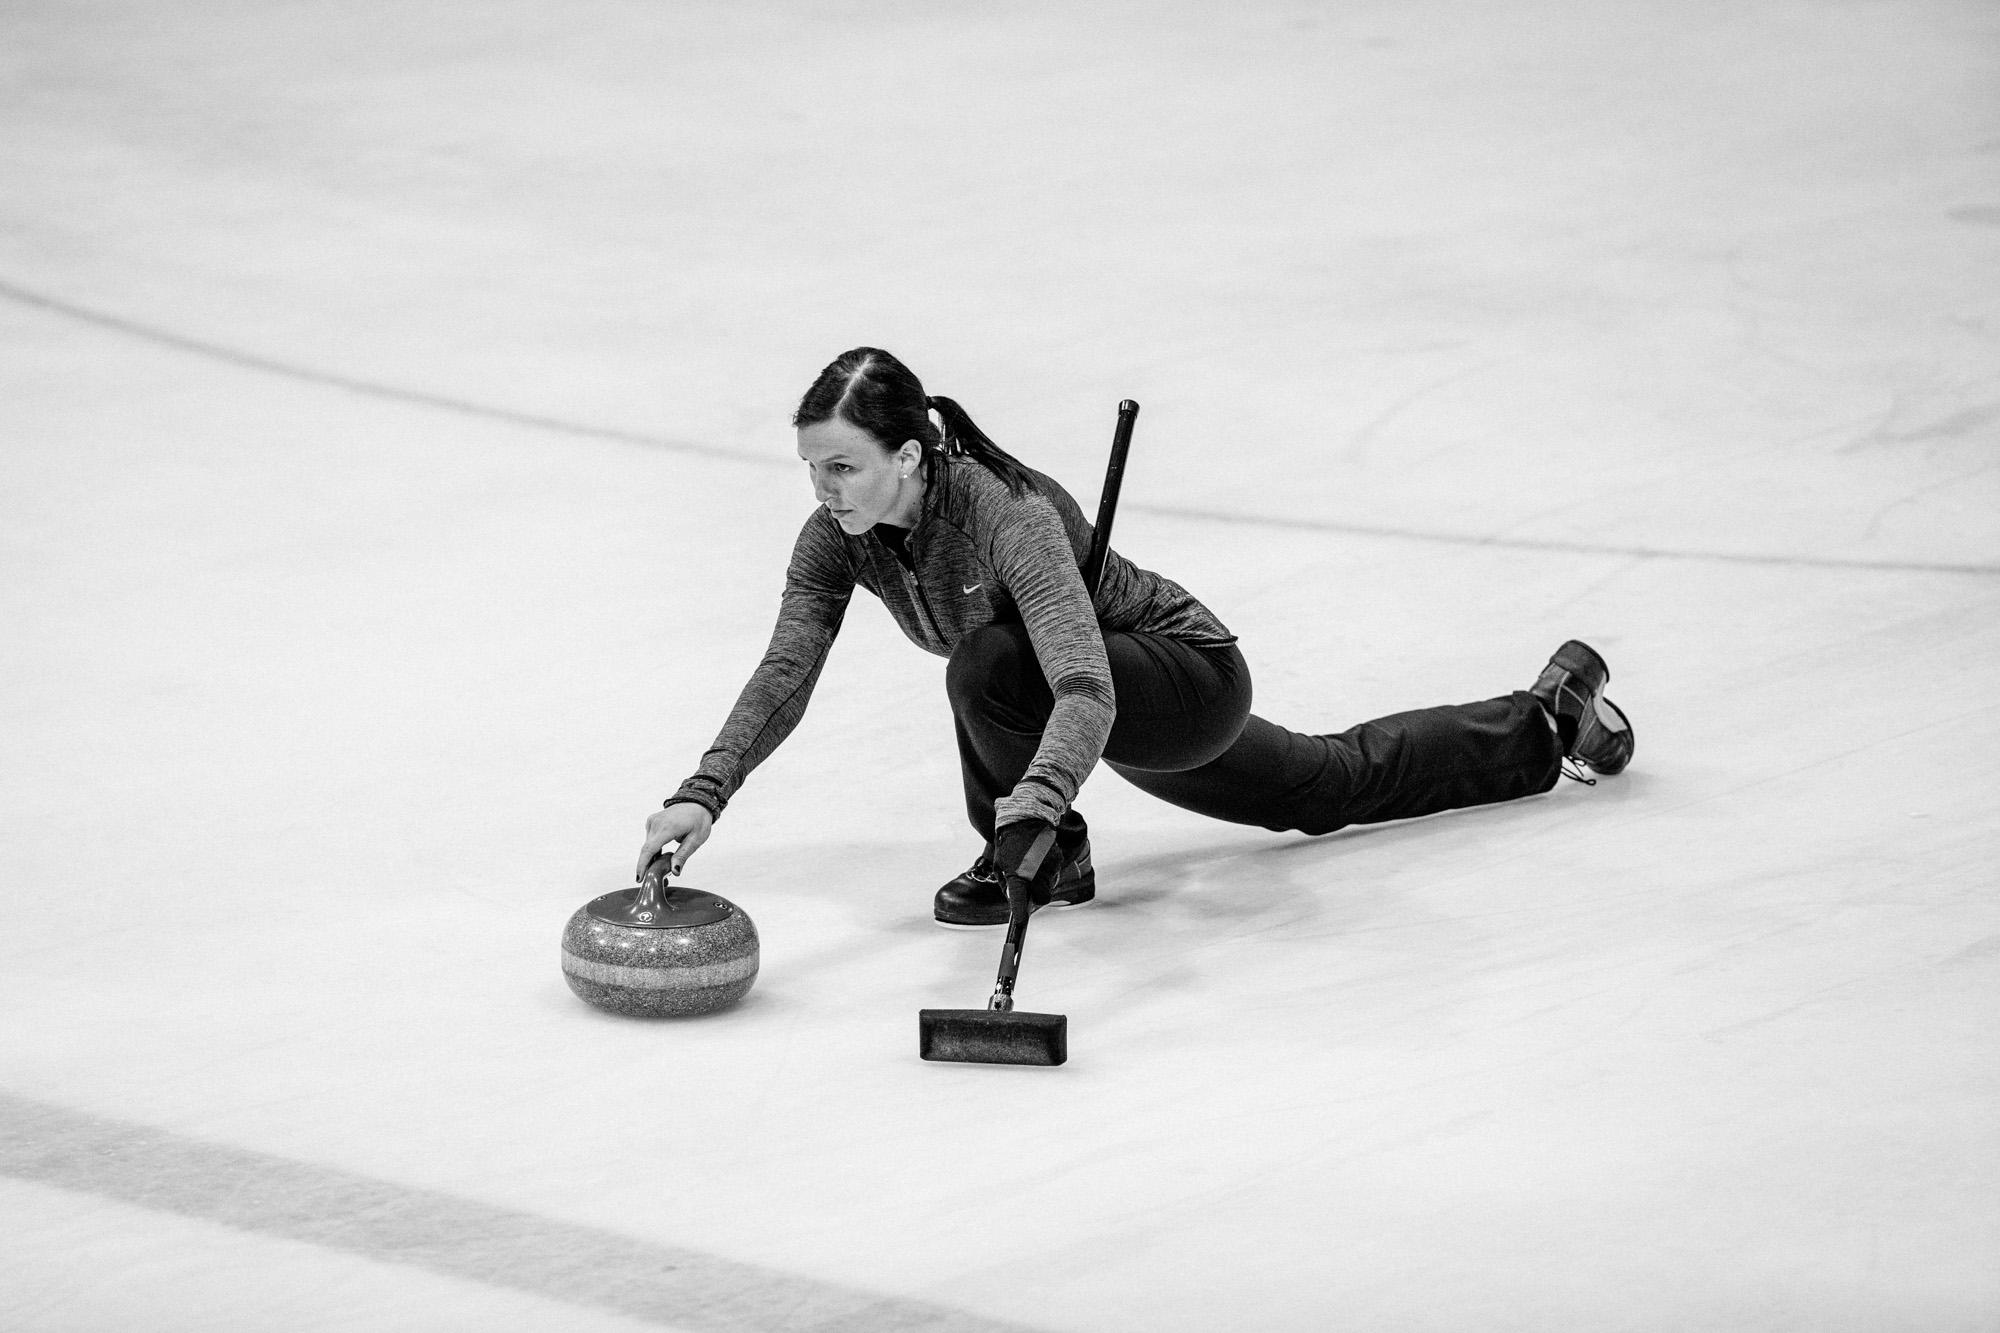 20170427_DSGContender_Curling 1980 2_1067.jpg